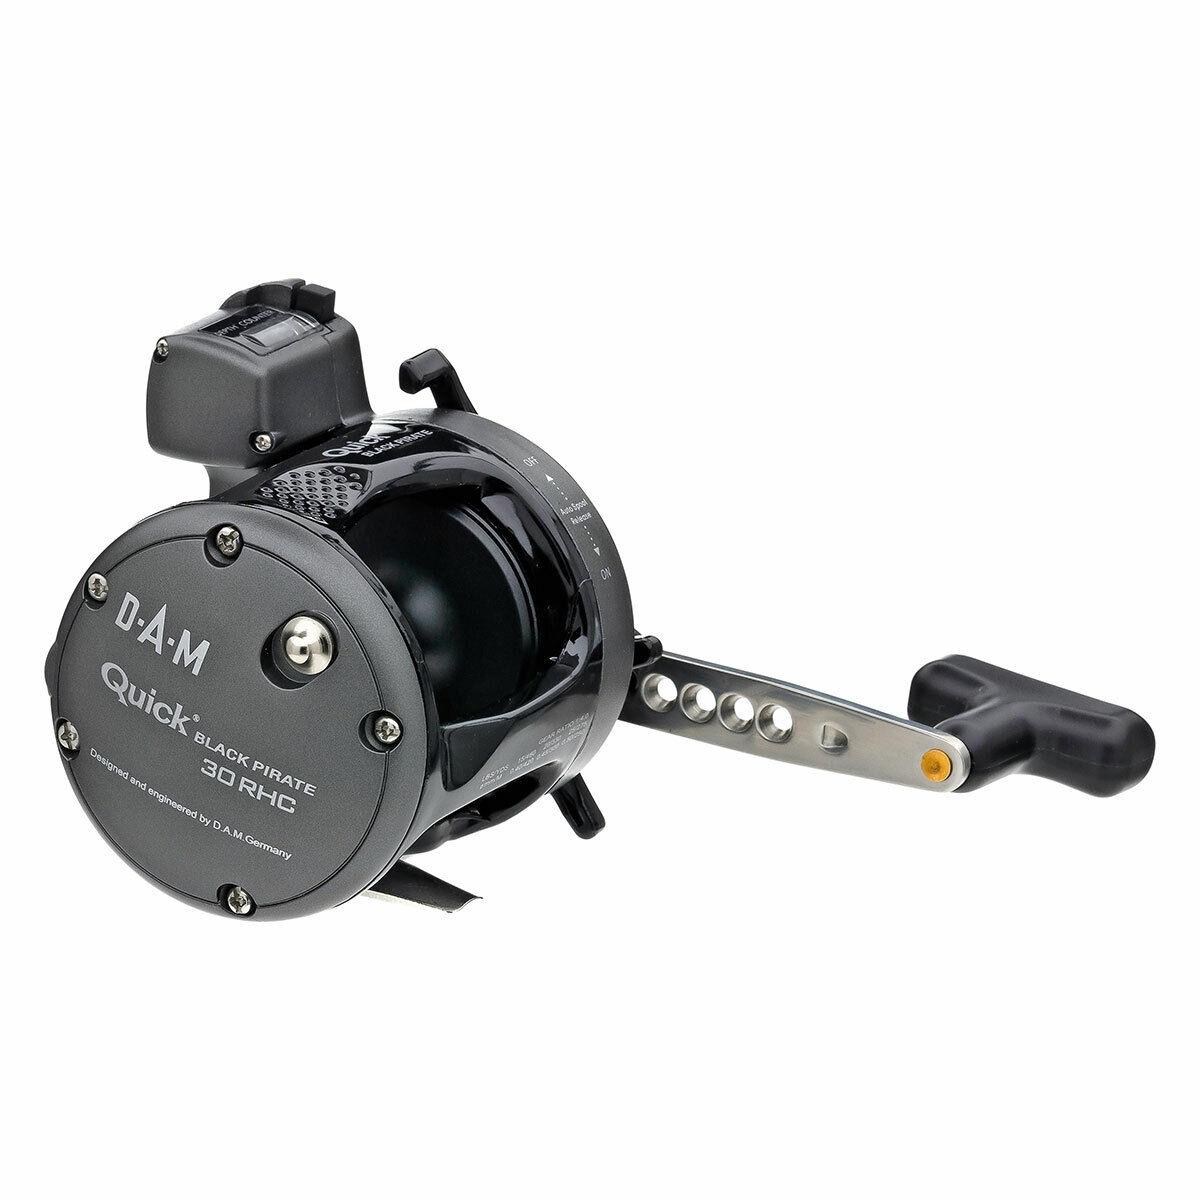 Dam Quick negro Pirate 45 RHC derecha mano con cuerda contador Rh linecounter New OVP